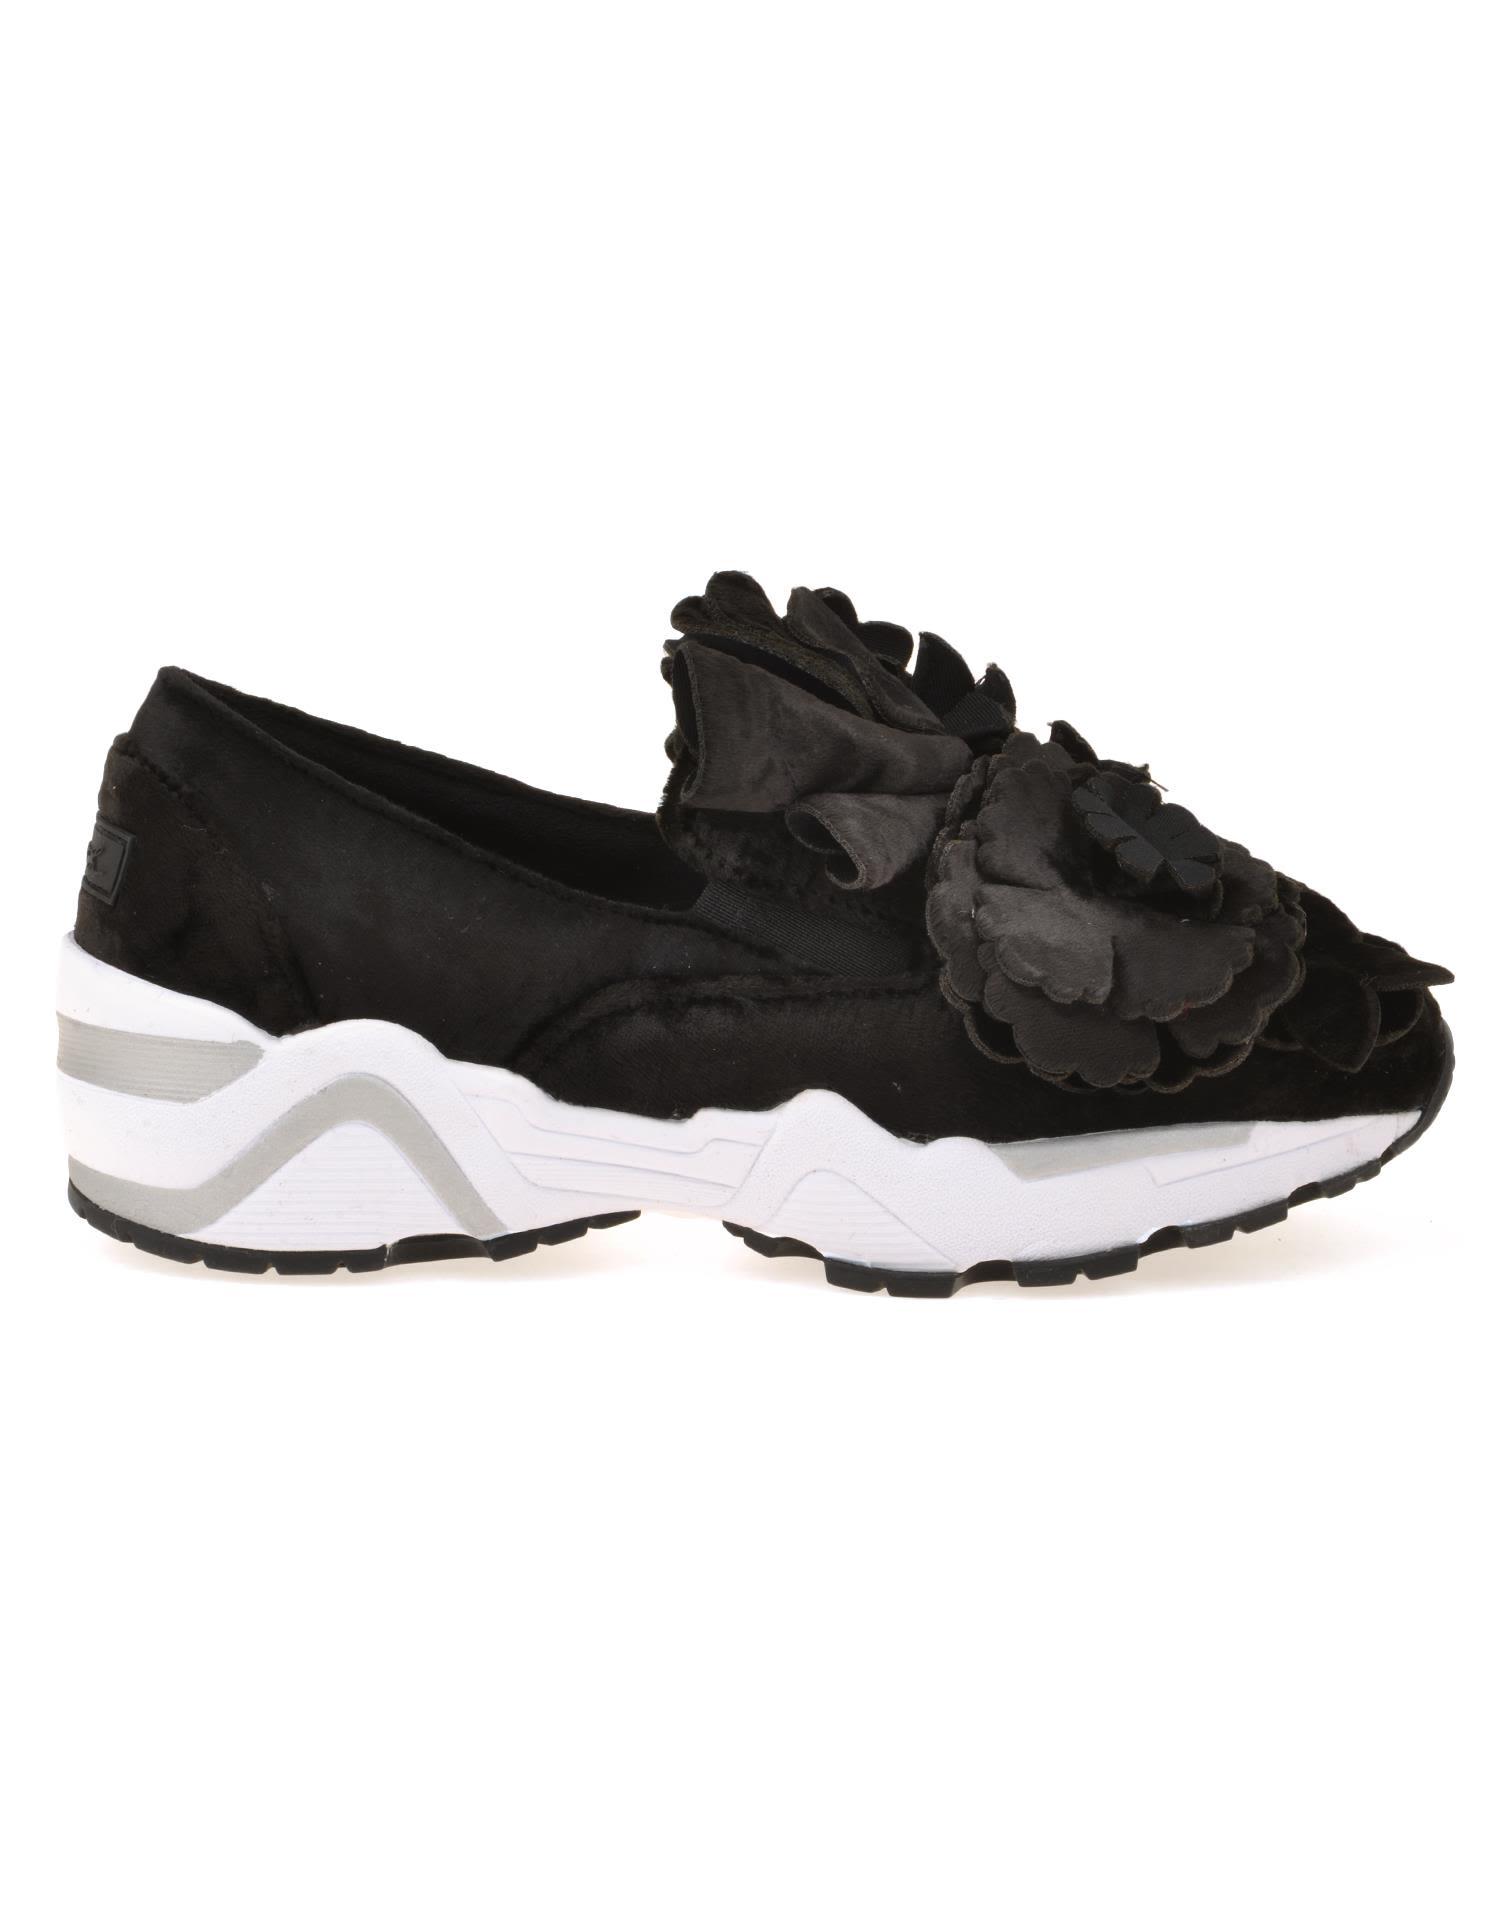 Suecomma Bonnie Slip On Sneaker